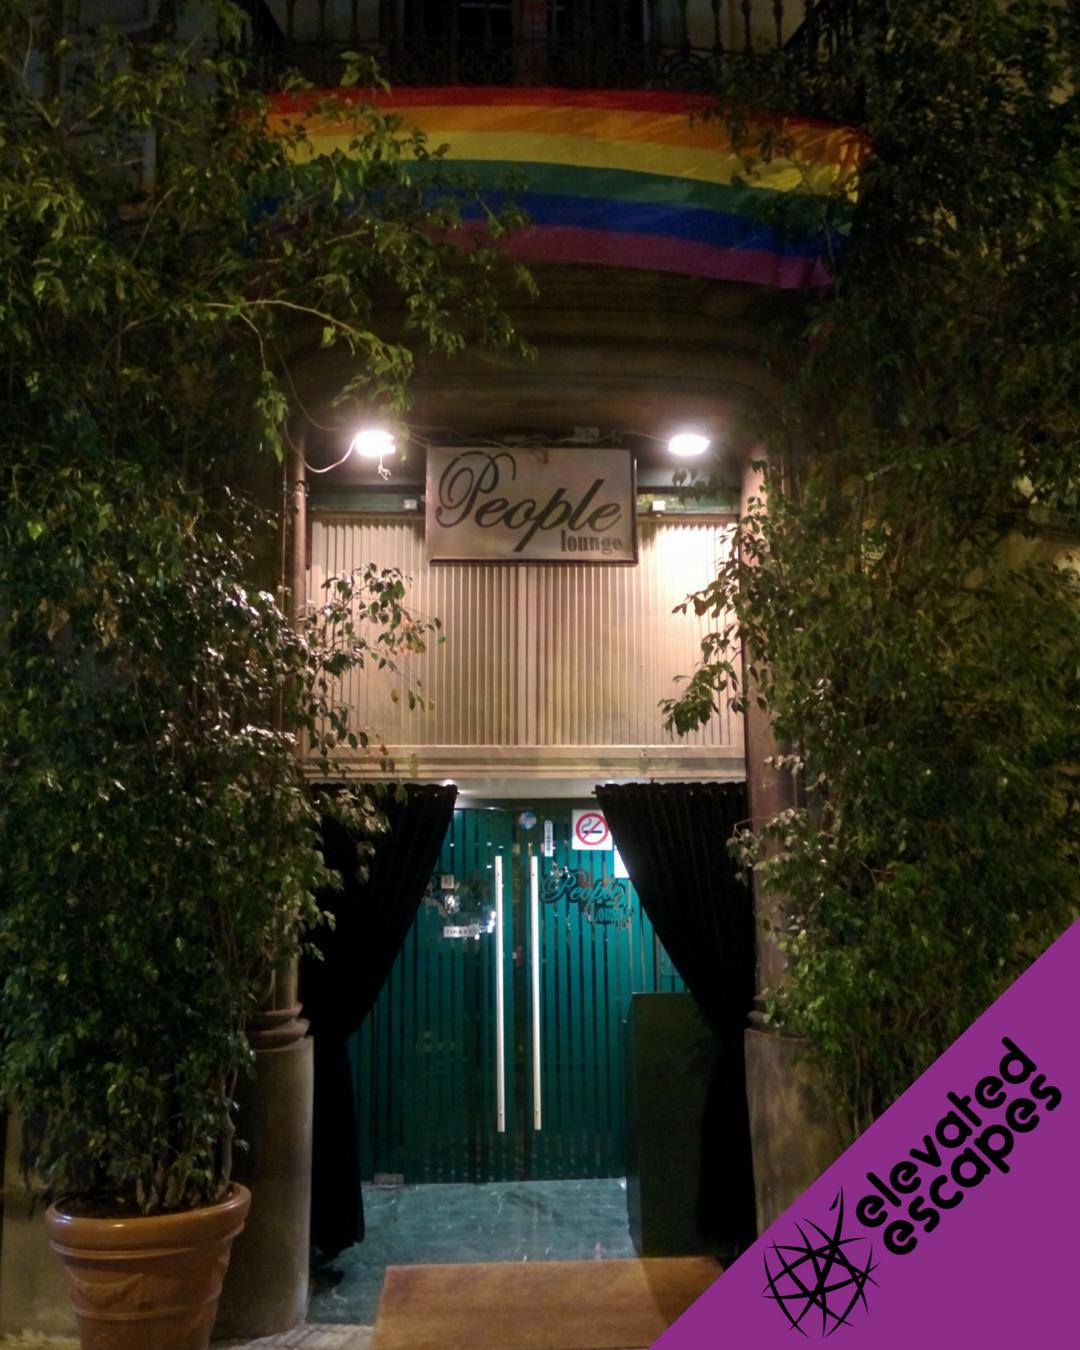 People Lounge Entrance